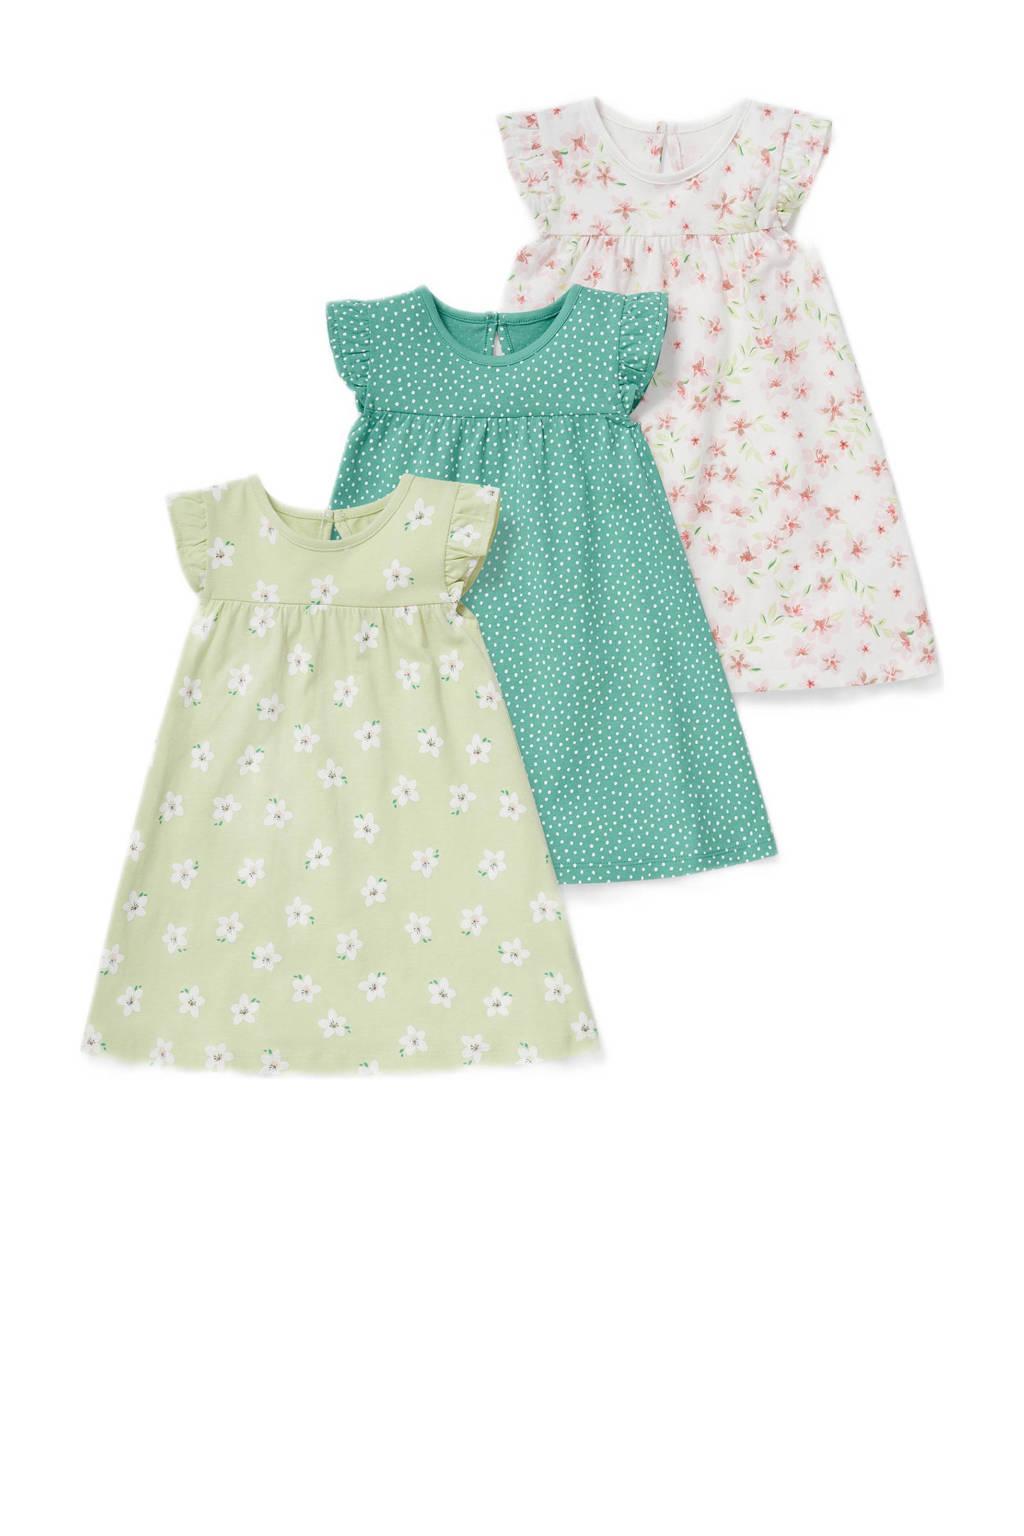 C&A Baby Club jurk - set van 3 lichtgroen/groen/ecru, Lichtgroen/groen/ecru